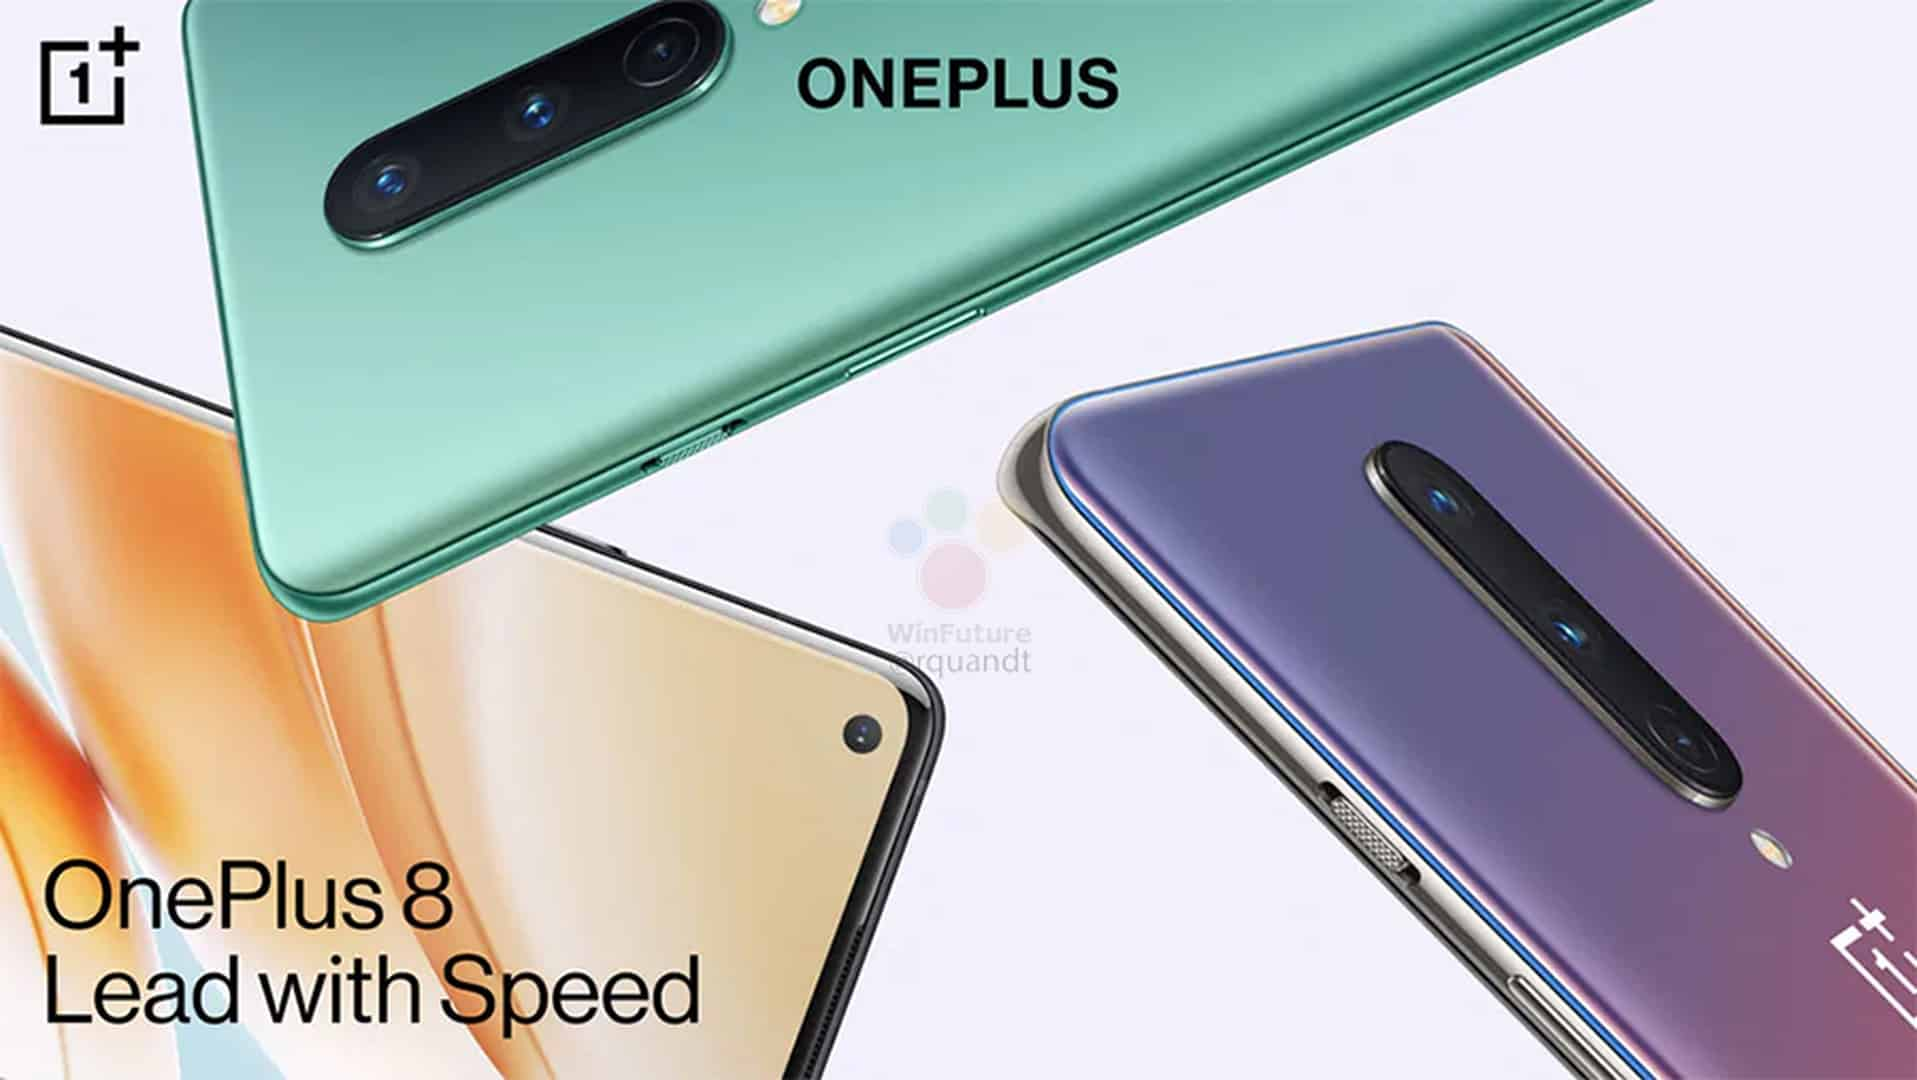 OnePlus 8 marketing materials leak 11